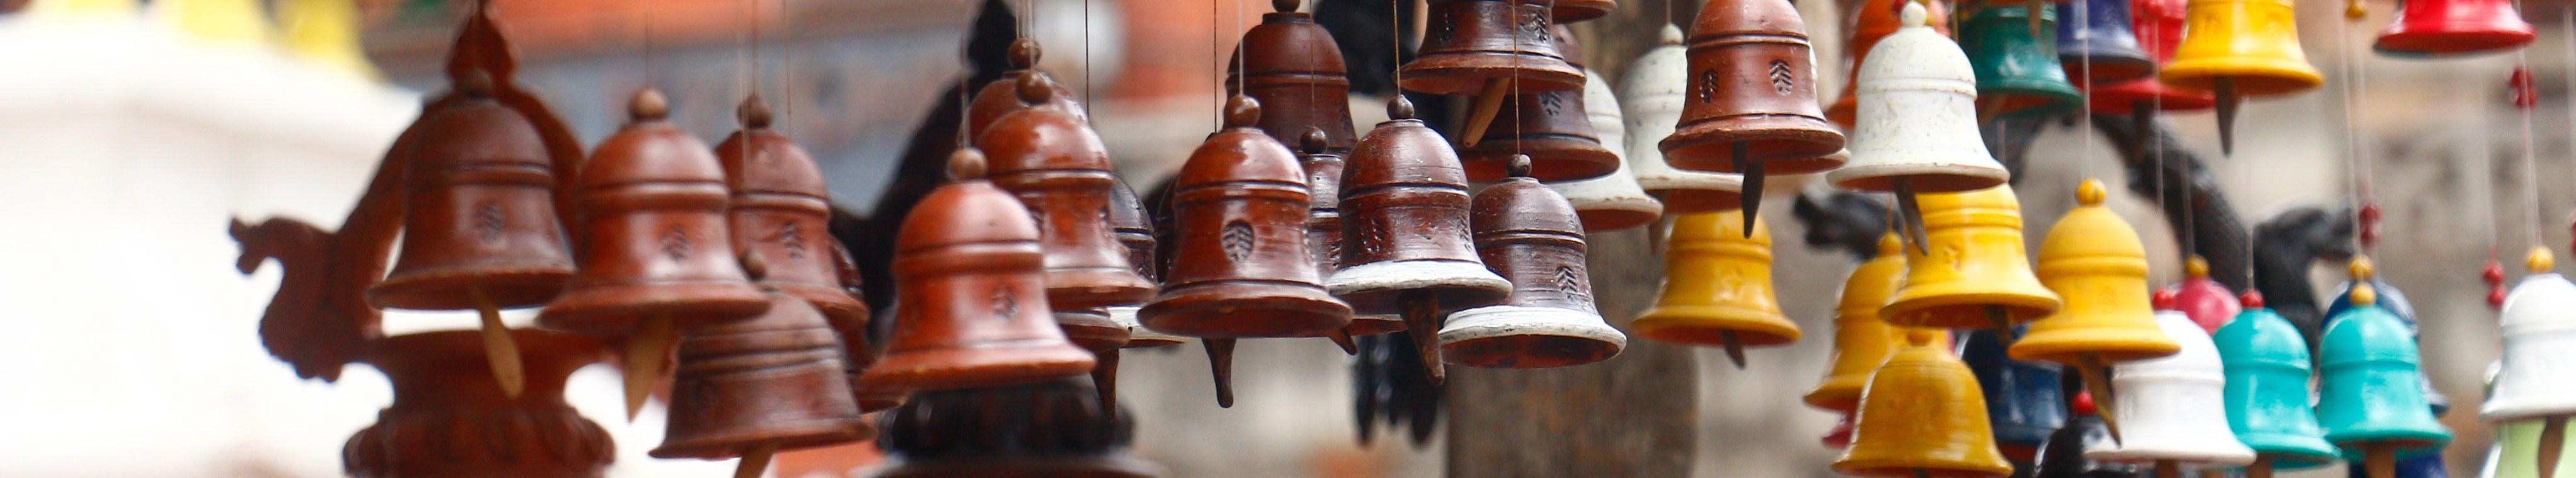 Pottery bells Bhaktapur